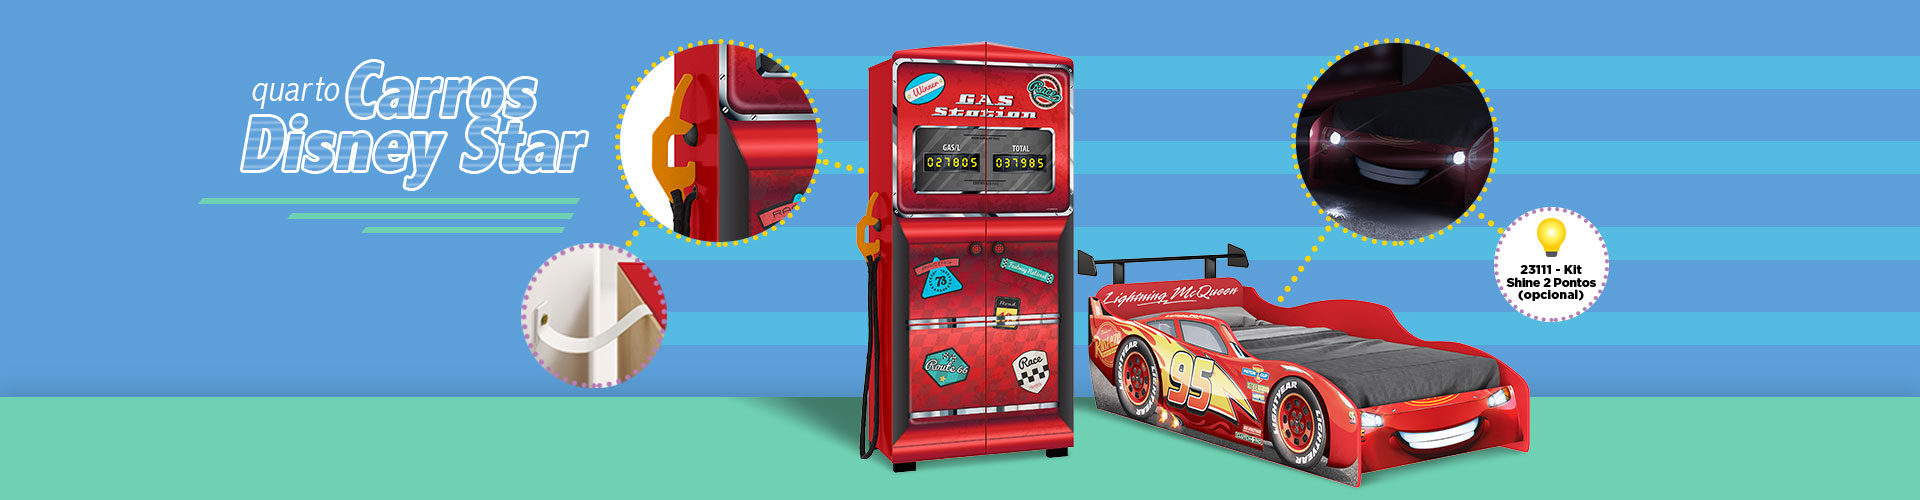 banner_meninos_carros-play_hw-plus